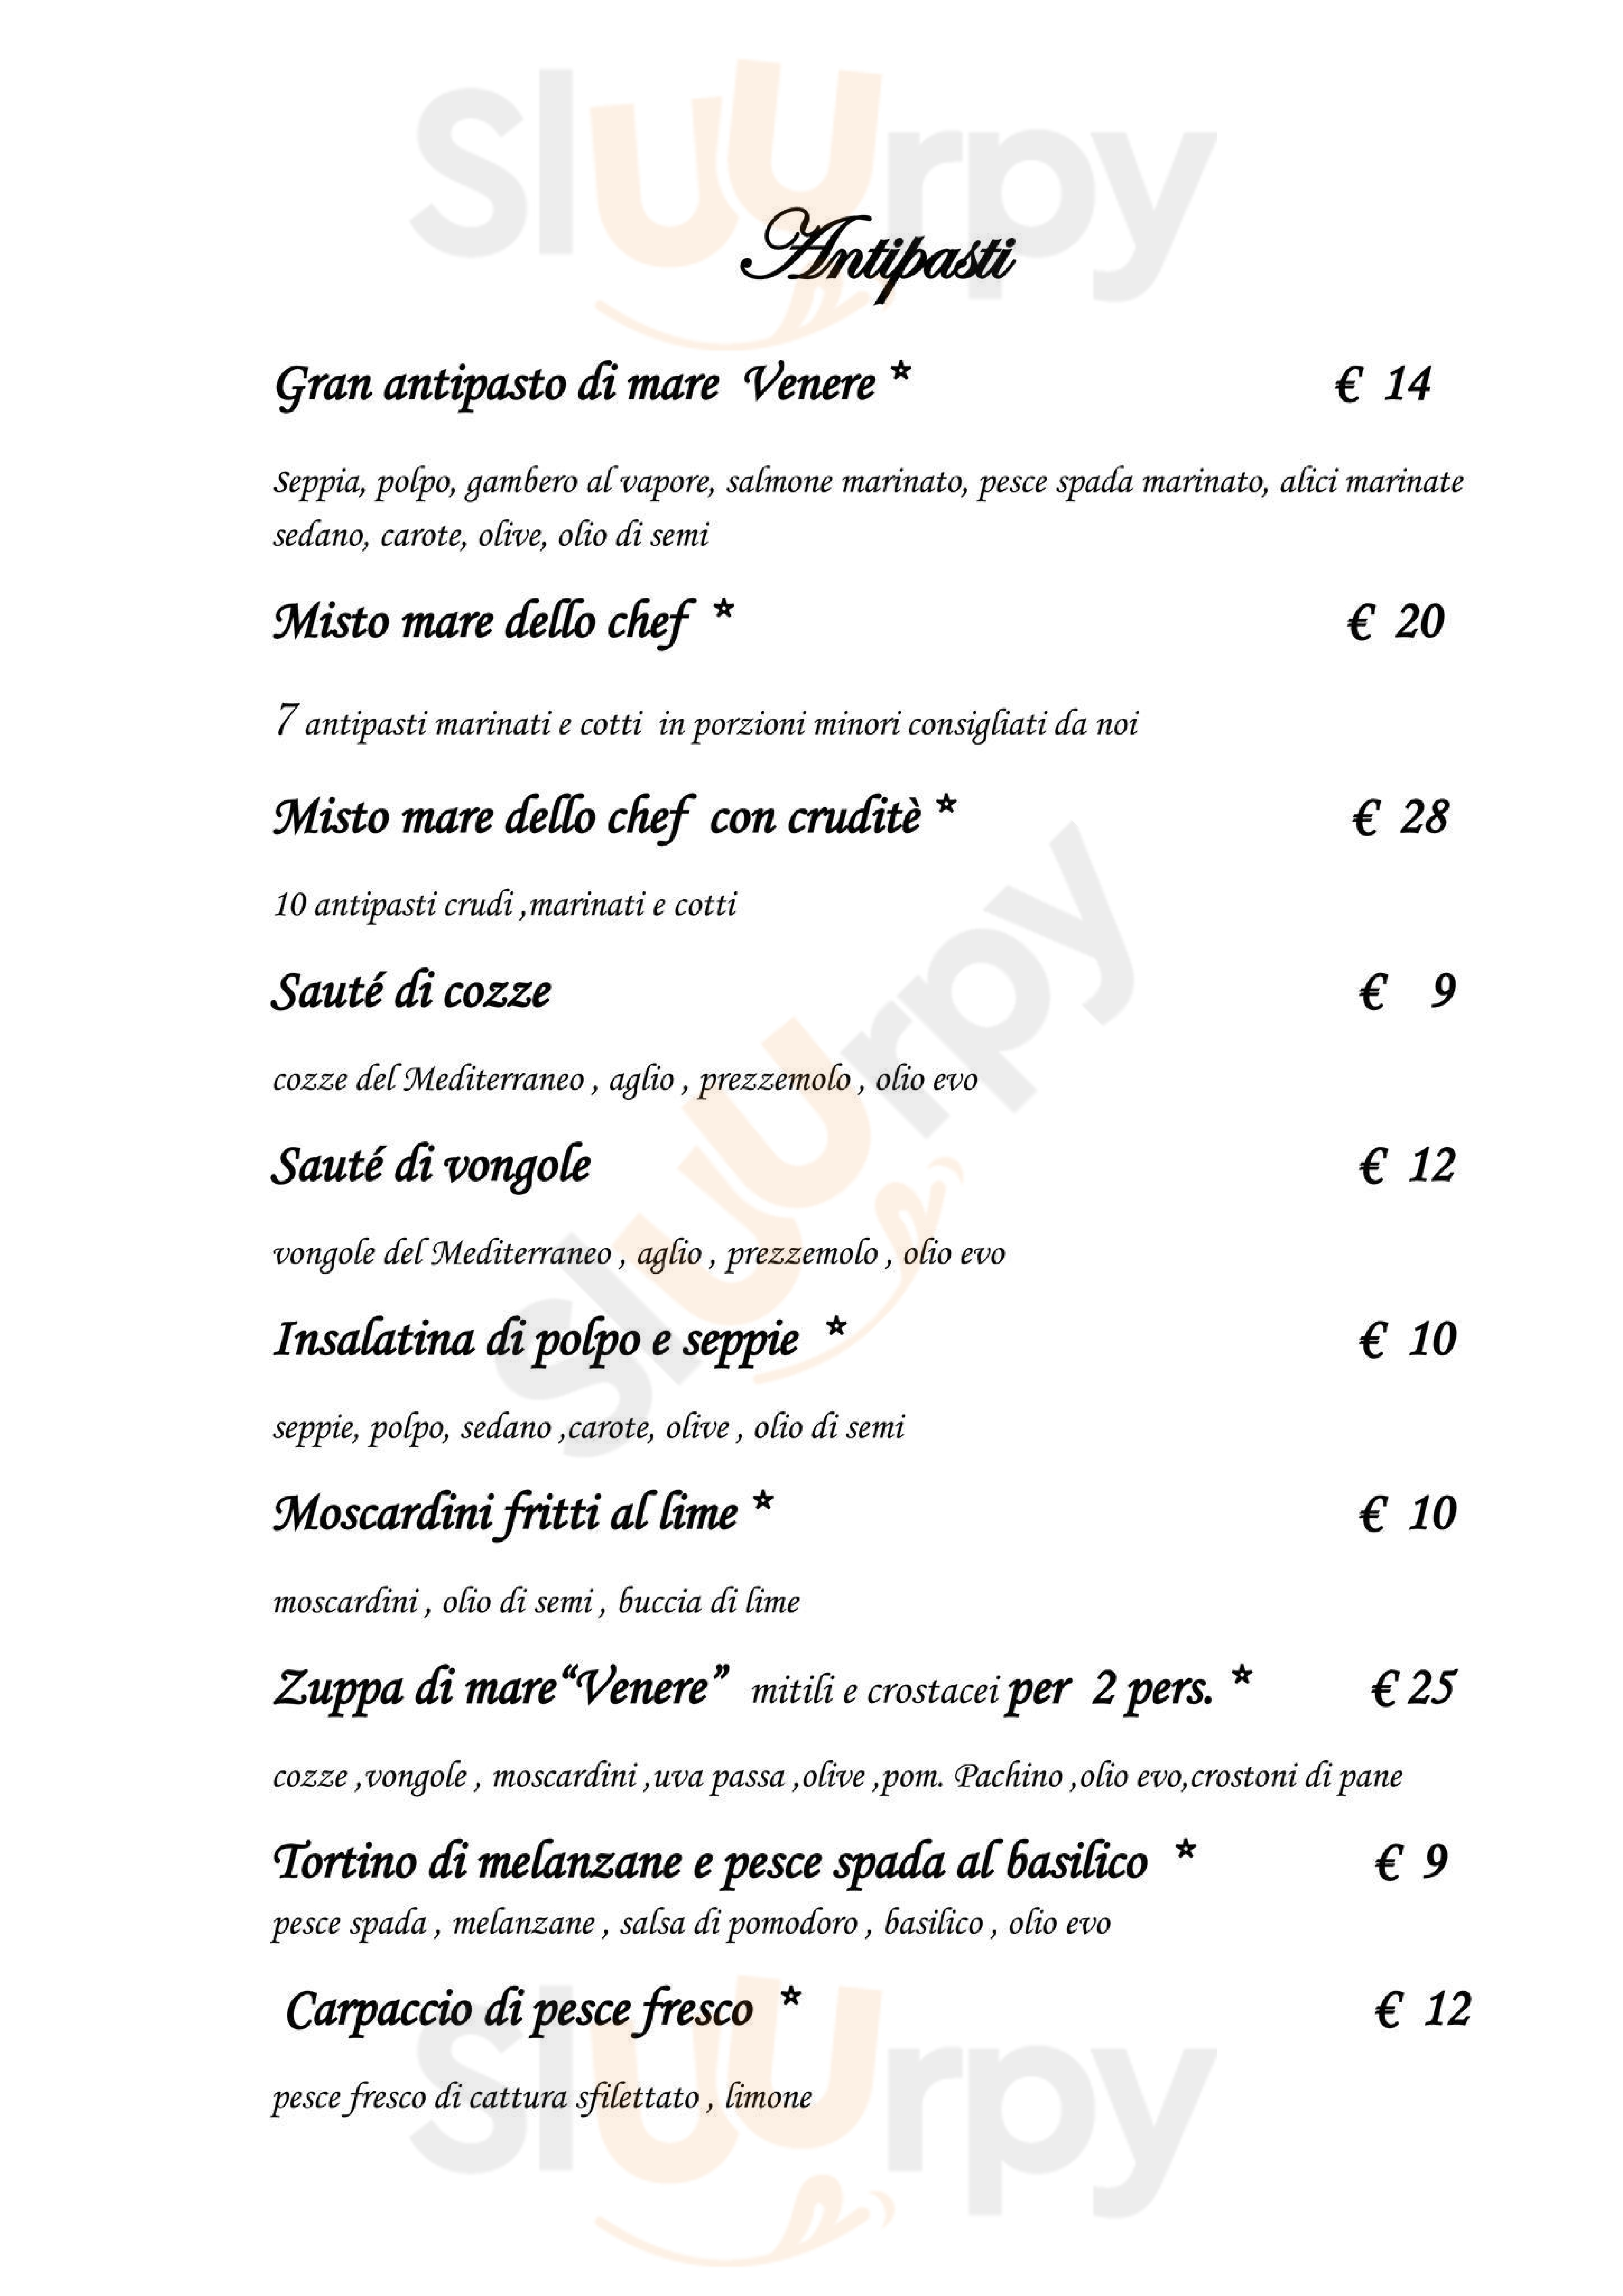 La Villa di Venere Pomezia menù 1 pagina